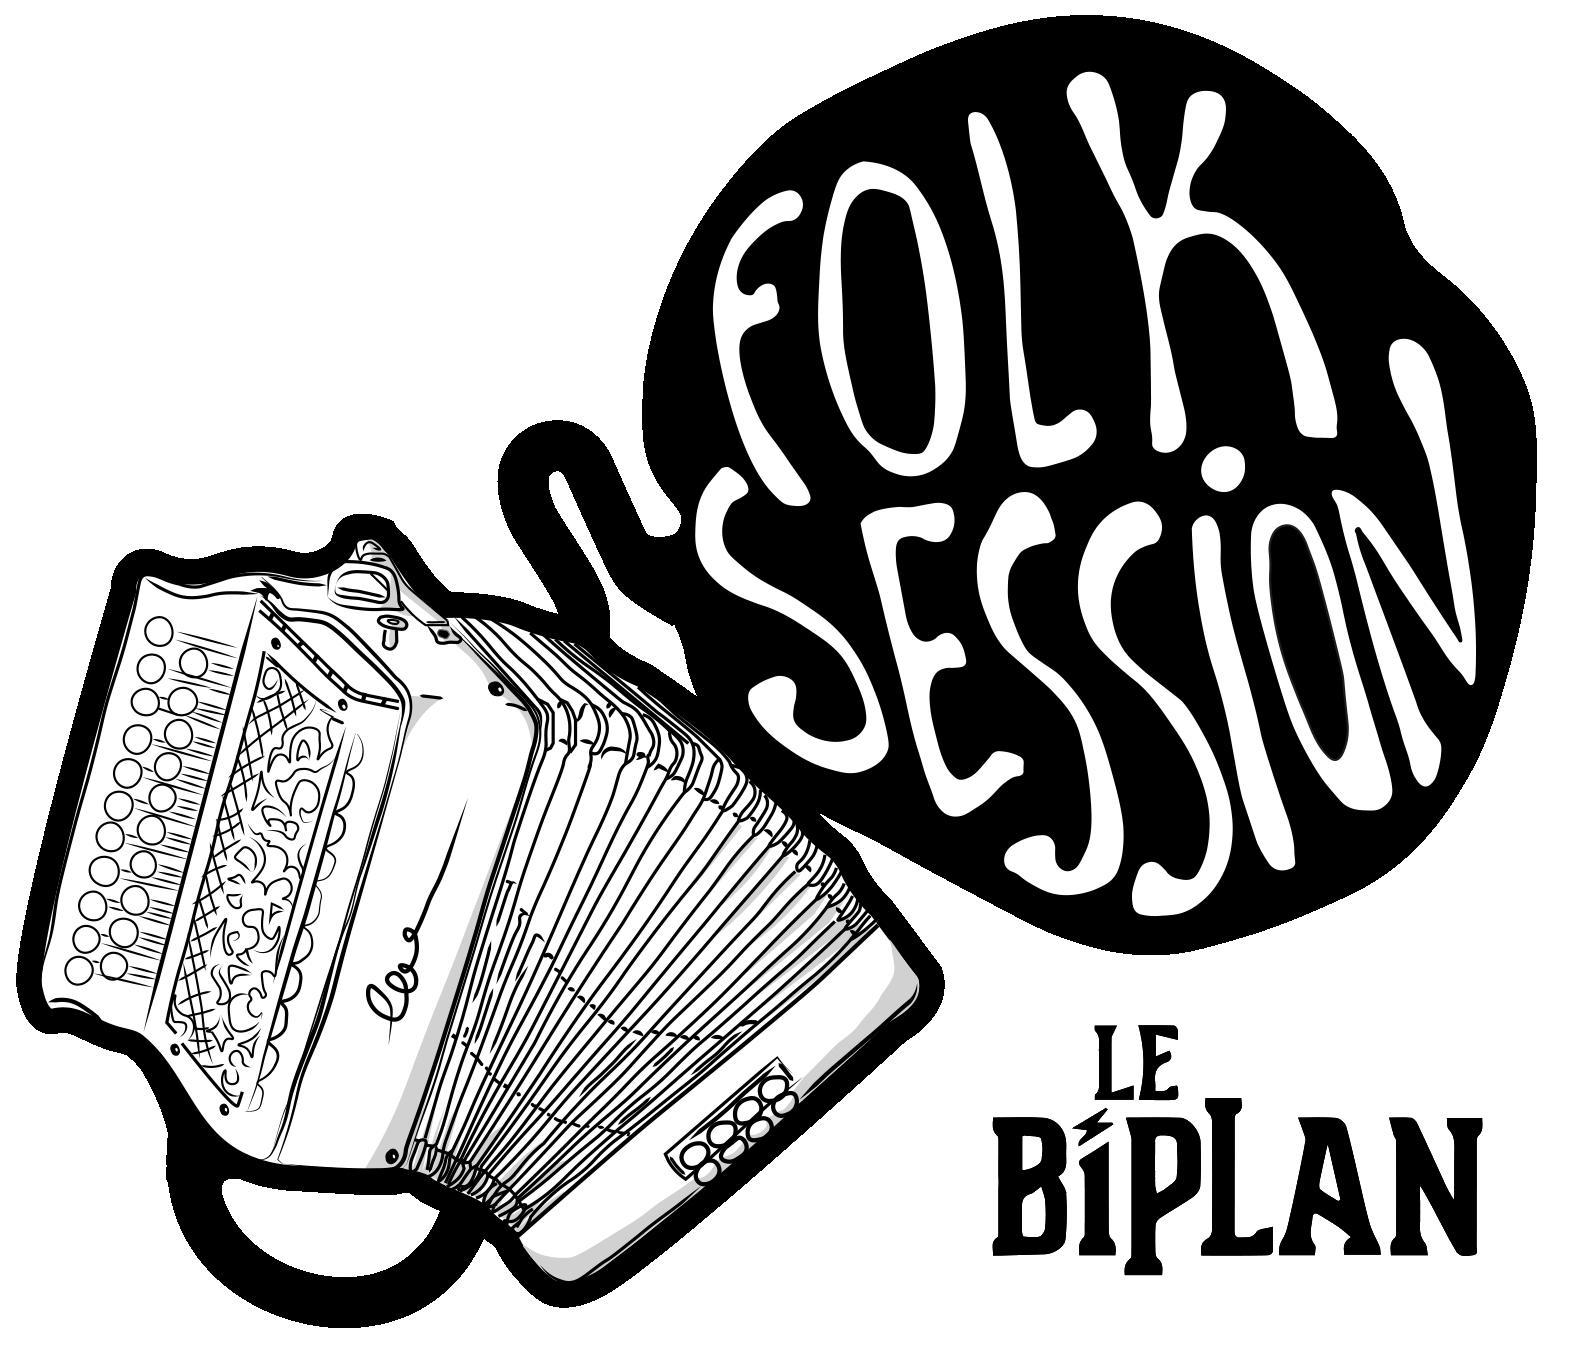 Folk session